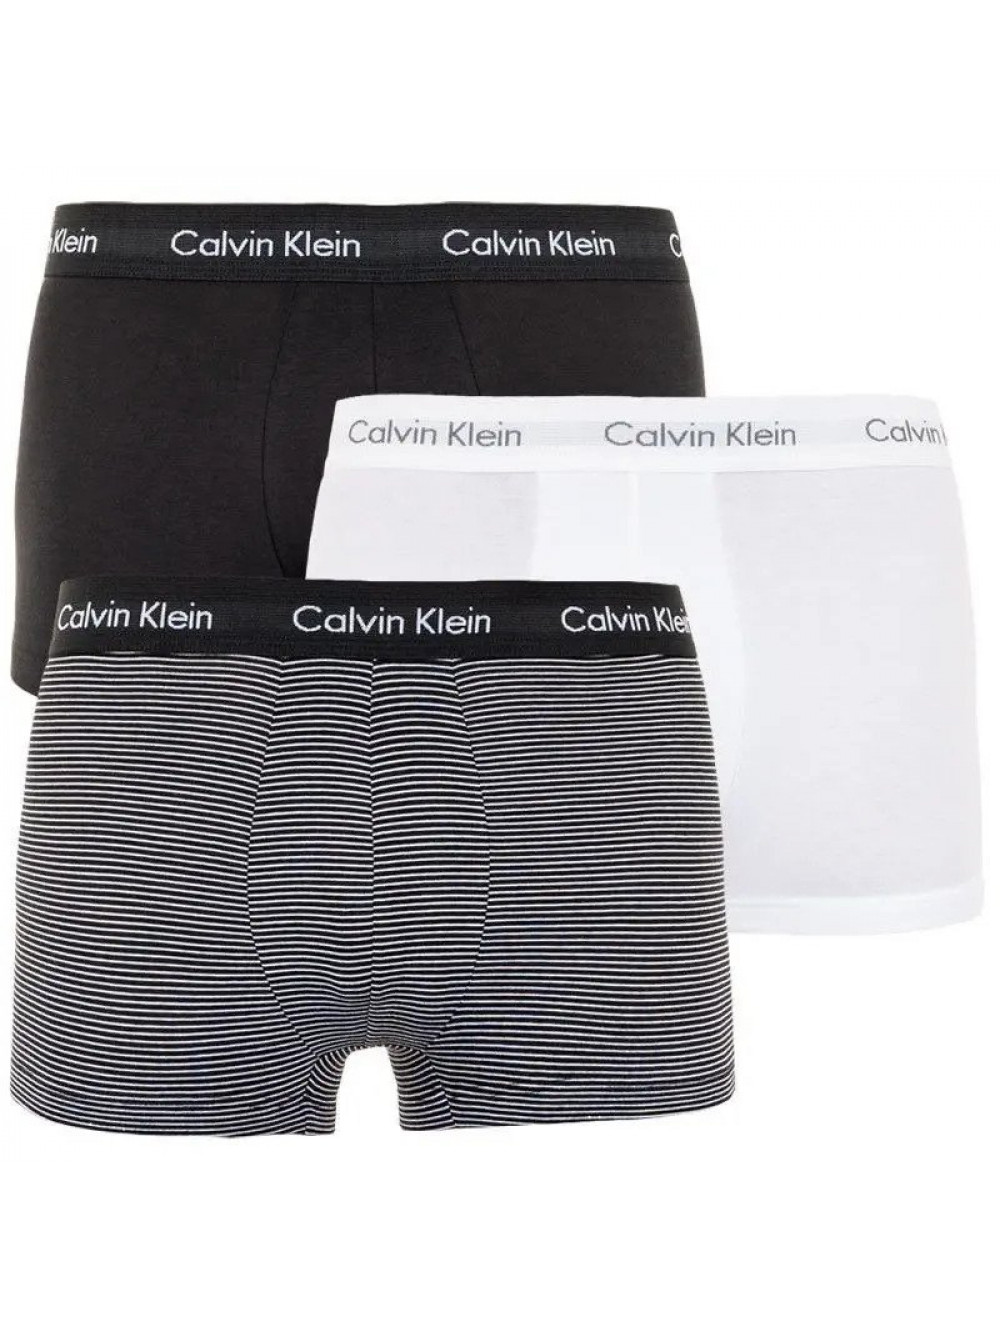 Pánske boxerky Calvin Klein Low Rise čierne, biele, pruhované 3-pack